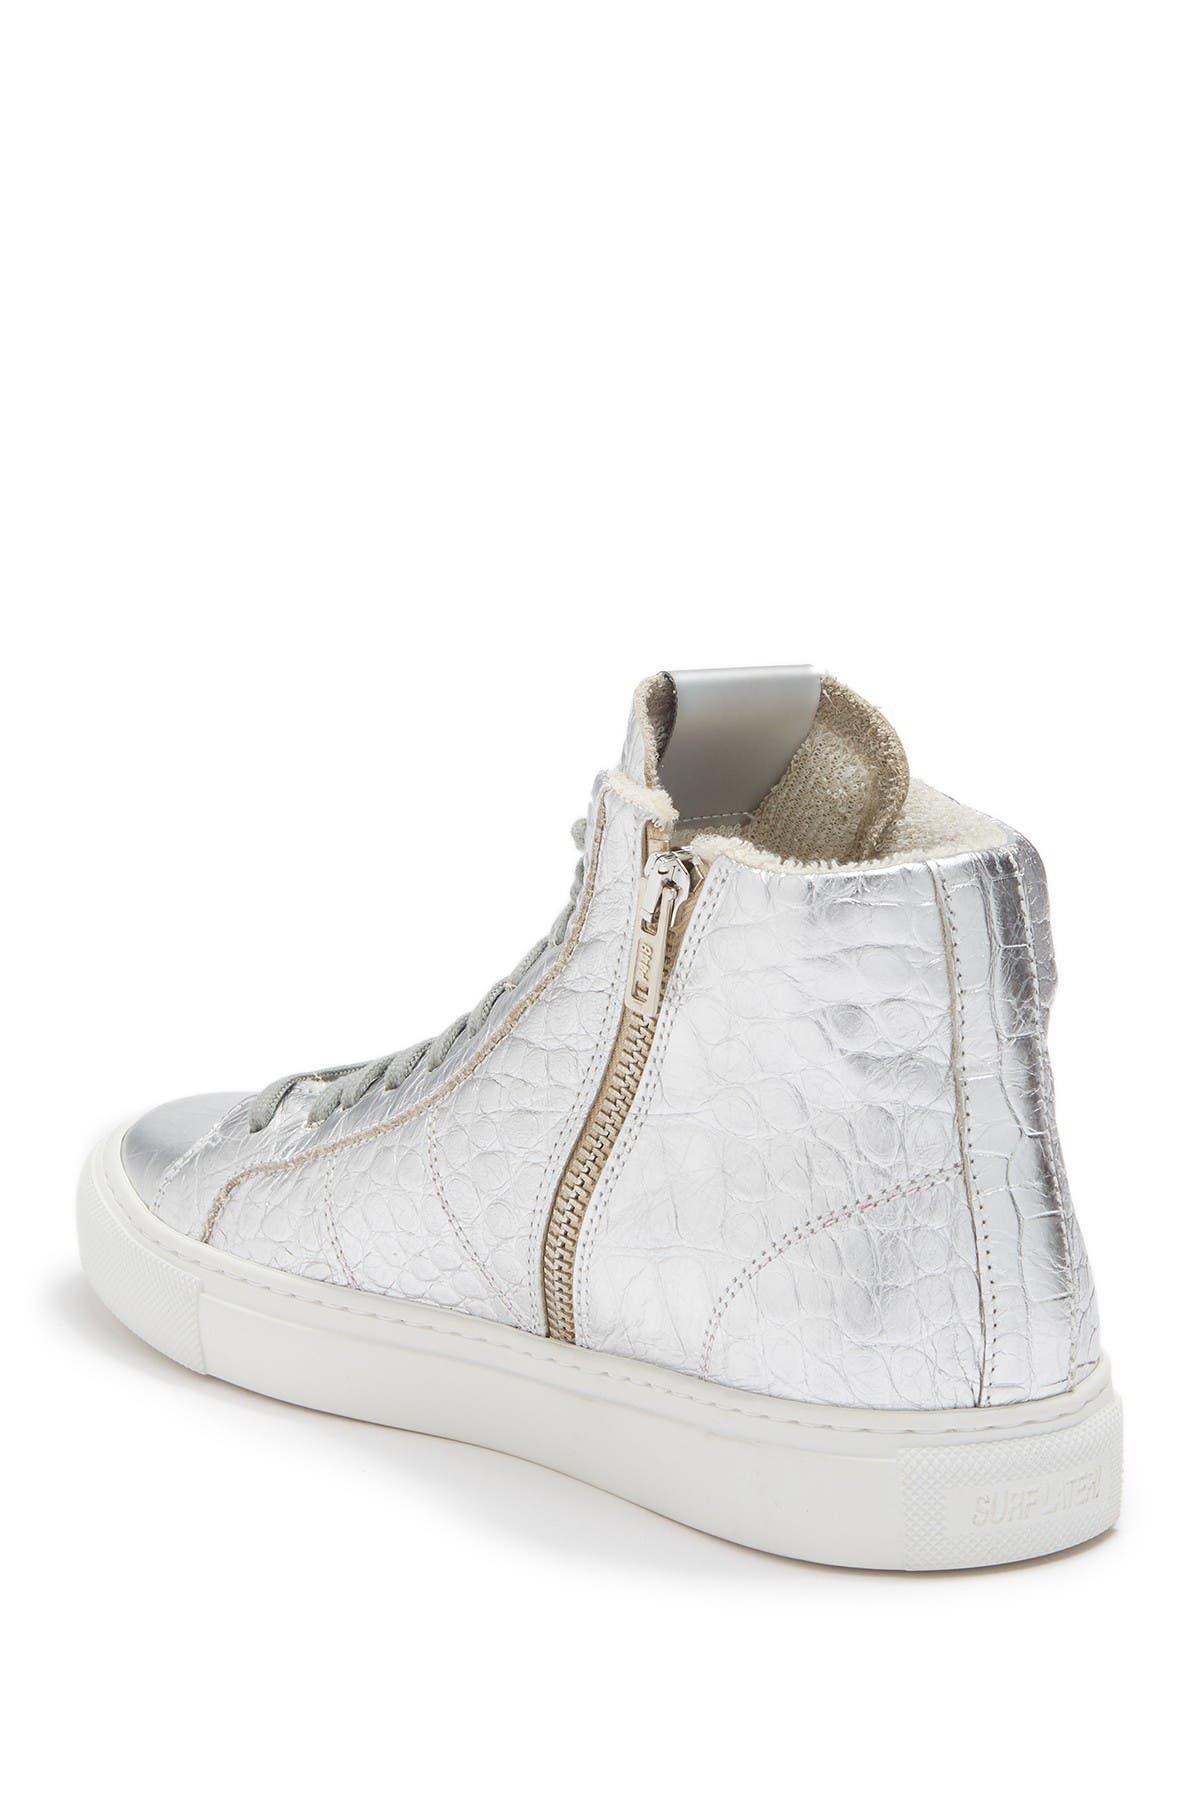 Image of P448 Star 2.0 Sneaker